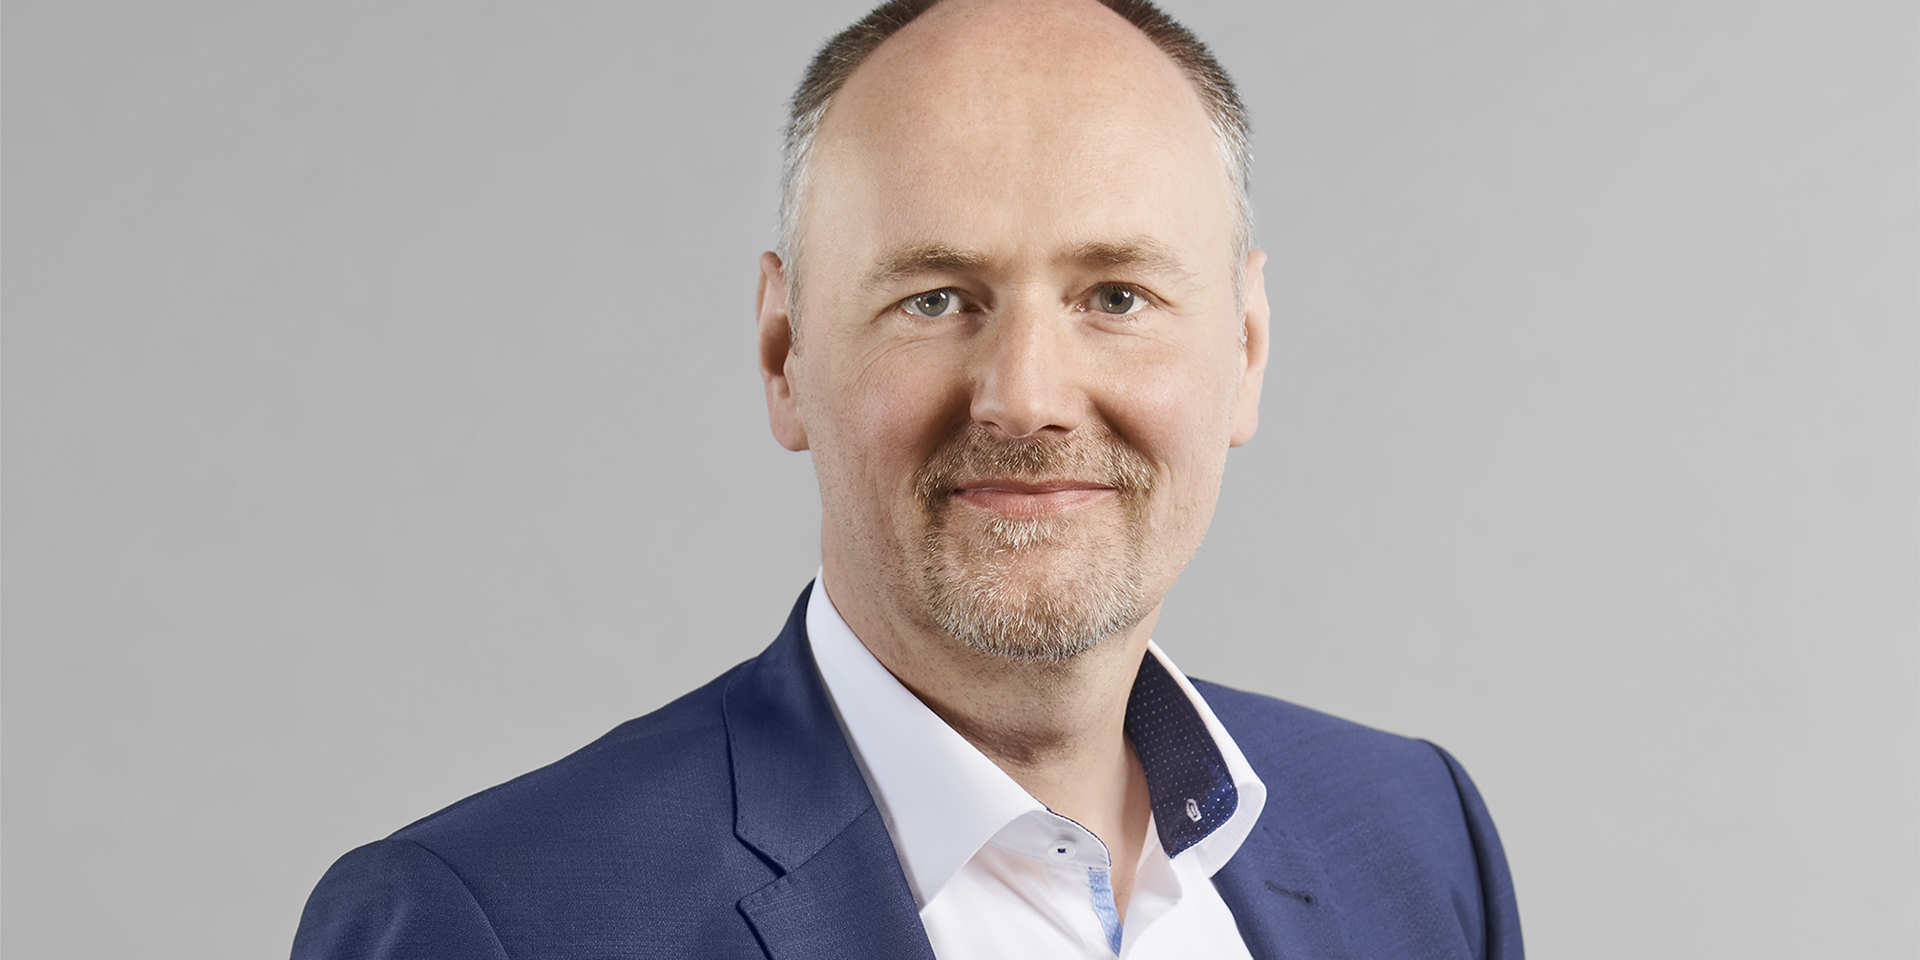 Stefan Reimers, ELKB/Rost